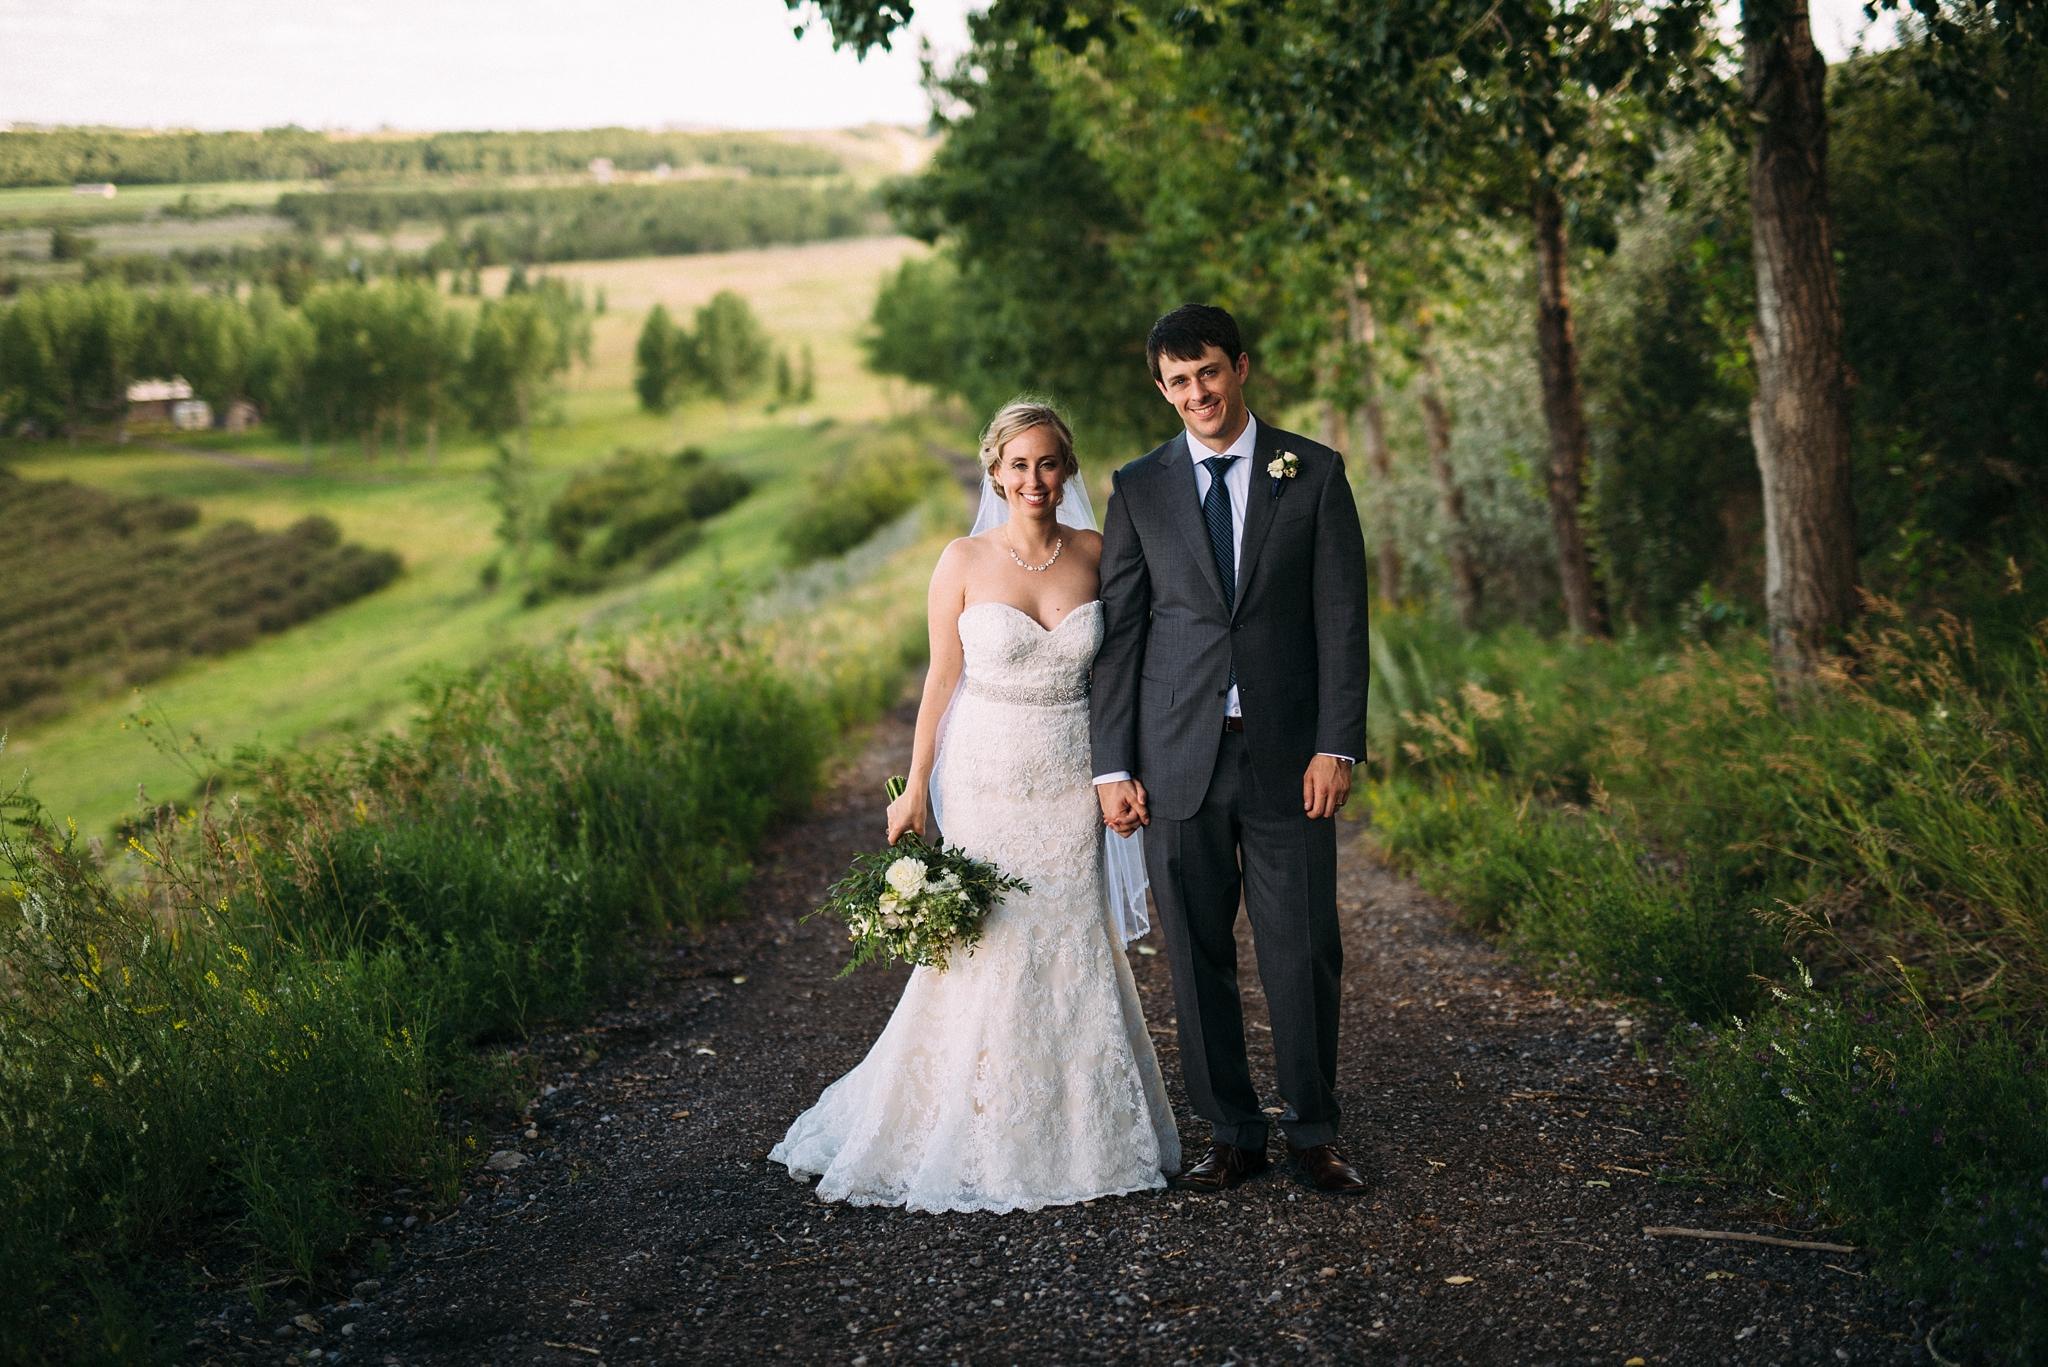 kaihla_tonai_intimate_wedding_elopement_photographer_4329